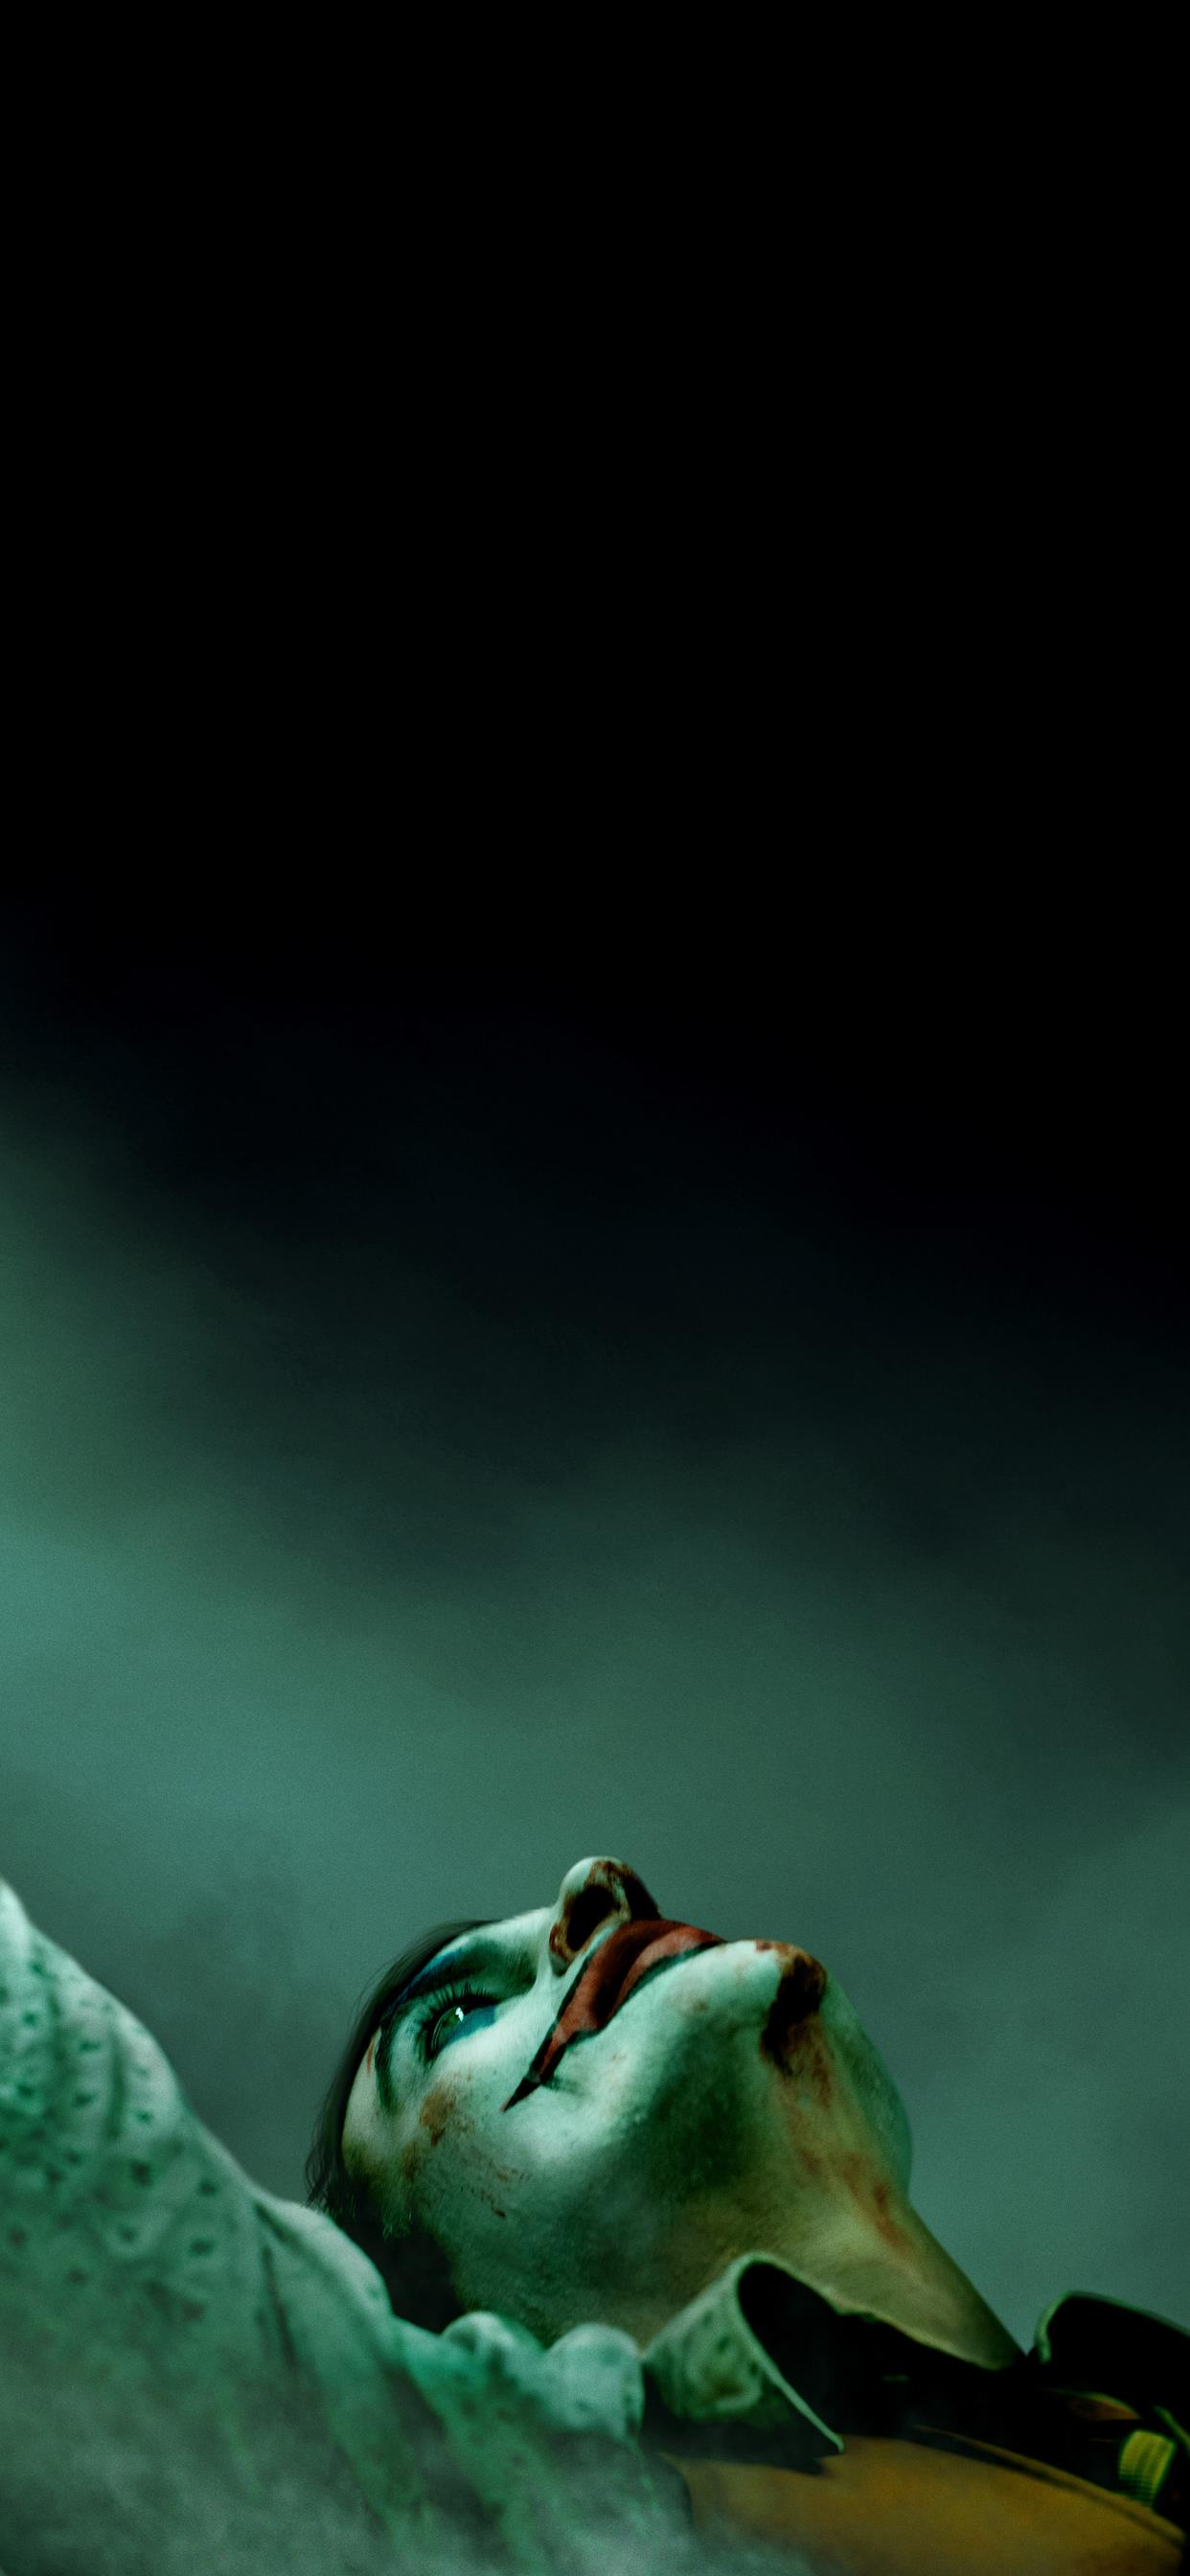 Joker Movie 4k Iphone X Wallpapers Free Download